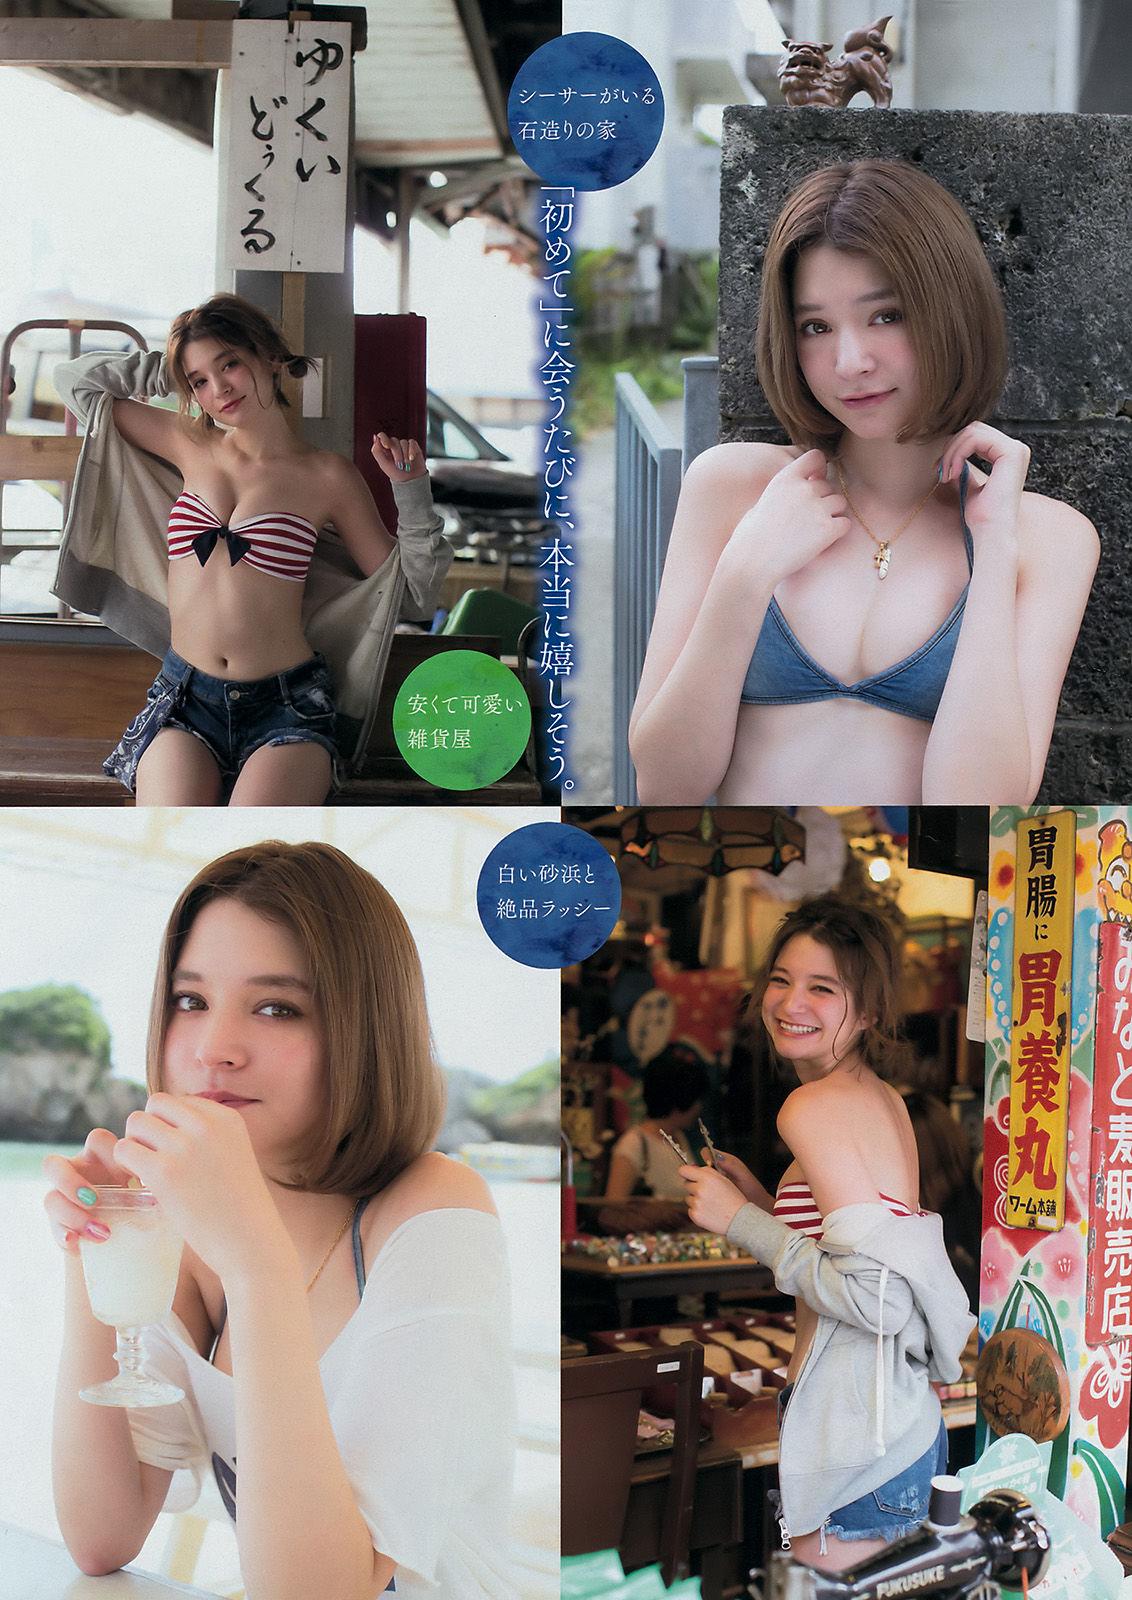 VOL.249 [Young Magazine]杂志:瑛茉茉莉超高清写真套图(11P)